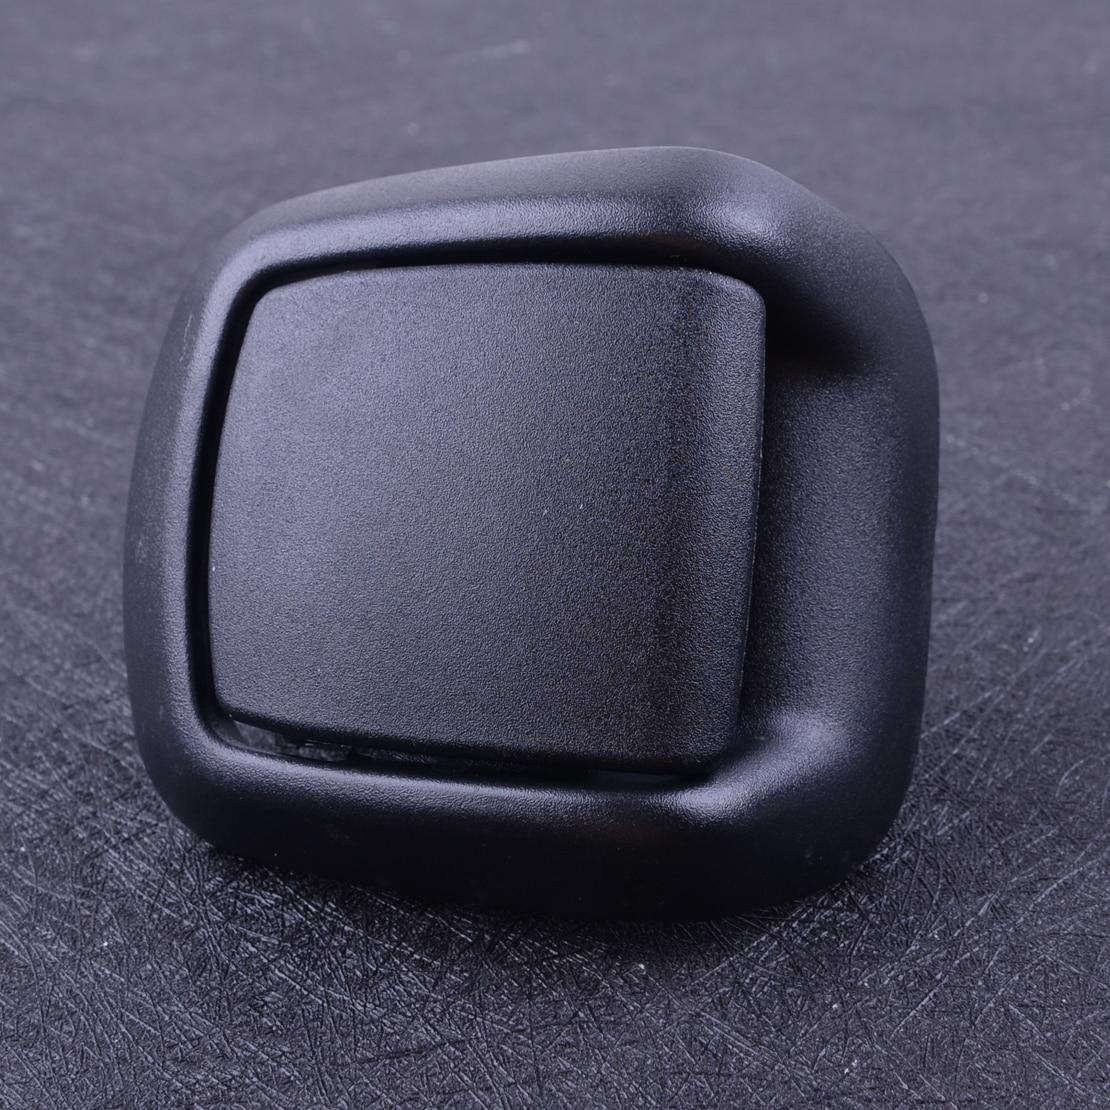 Plastic Black Car Inner Front Left Seat Tilt Handle Fit For Ford Fiesta MK6 VI 3 Door 2002 2003 2004 2005 2006 2007 2008 1417521